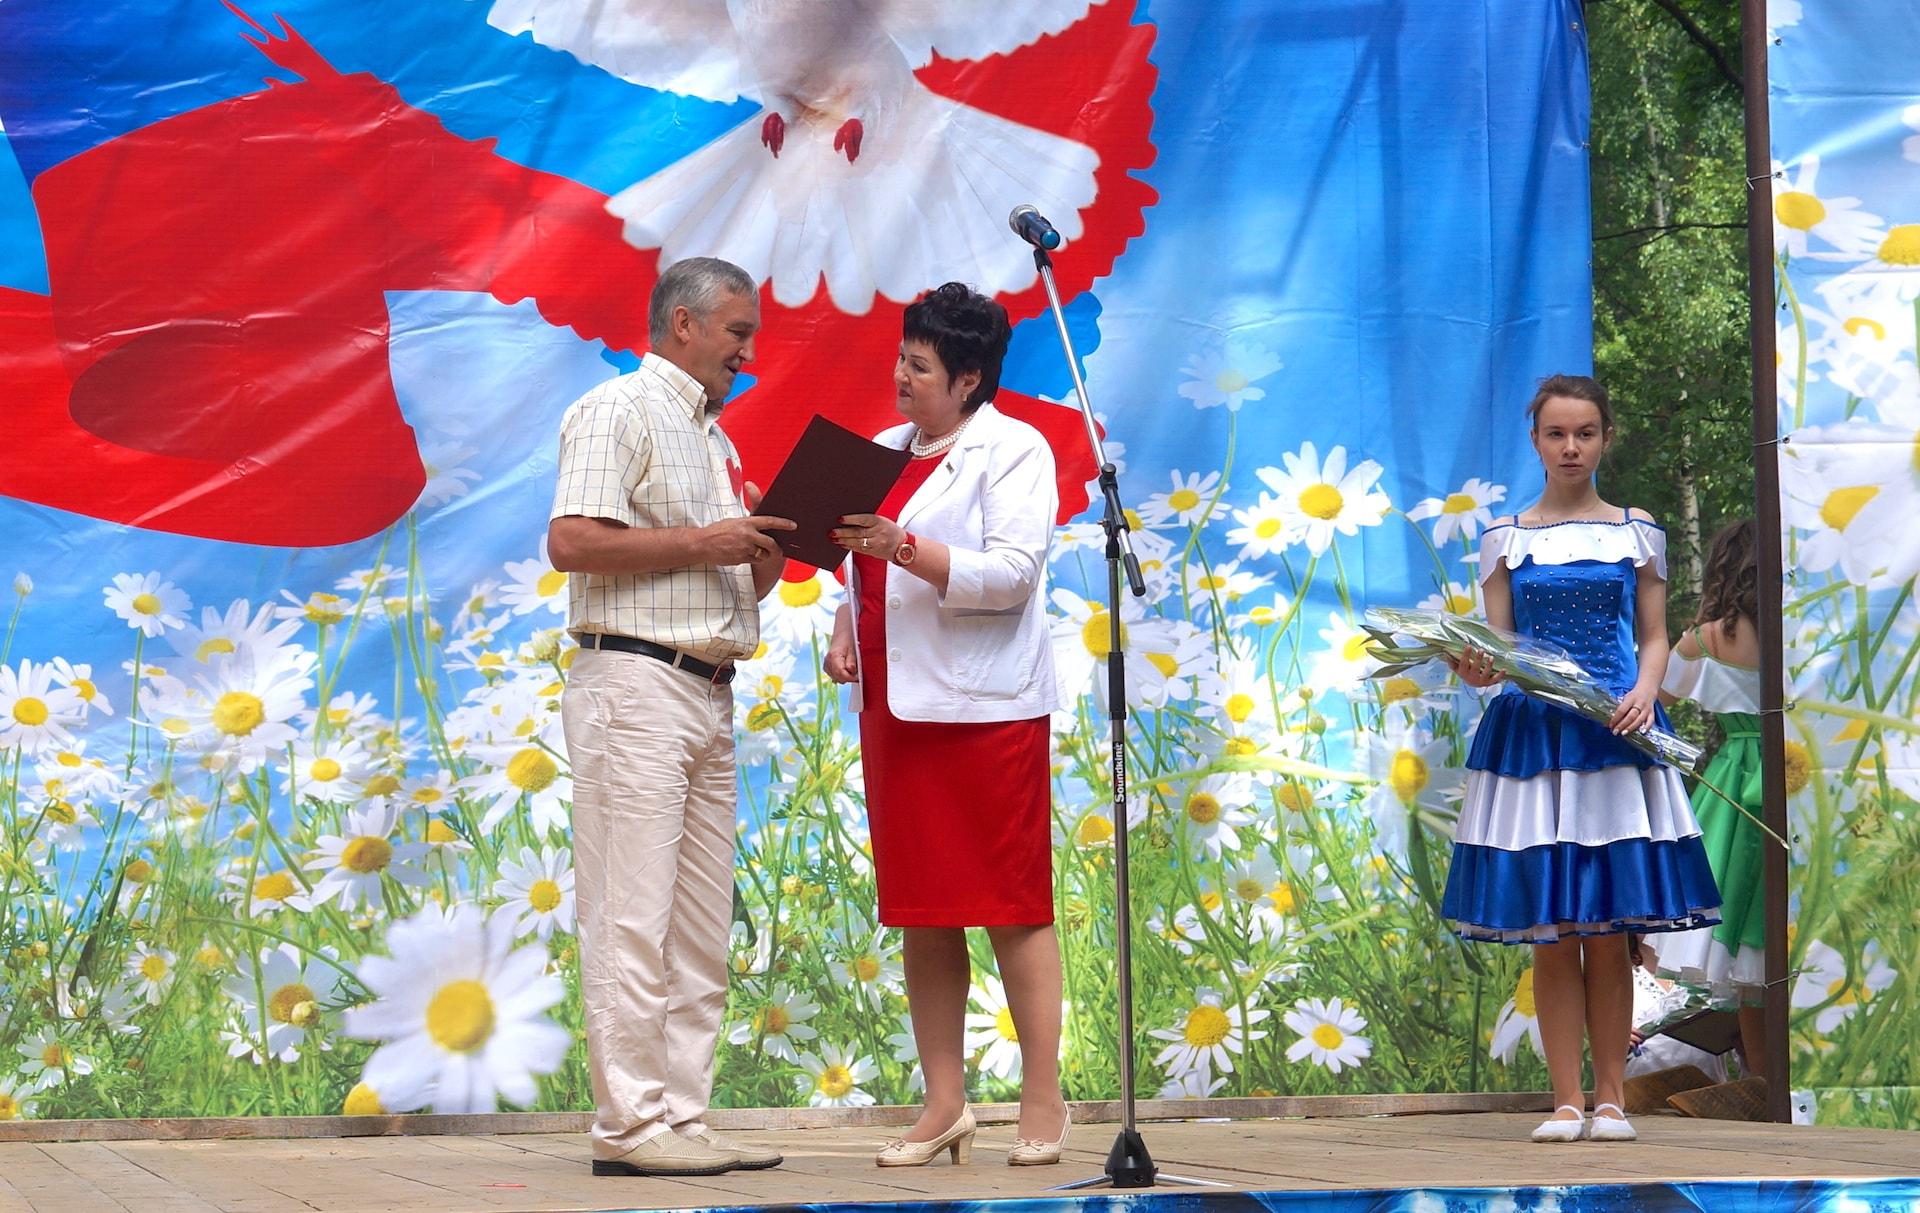 Александр Леонидович Кушнарёв поздравляет Нину Алексеевну Чигрину